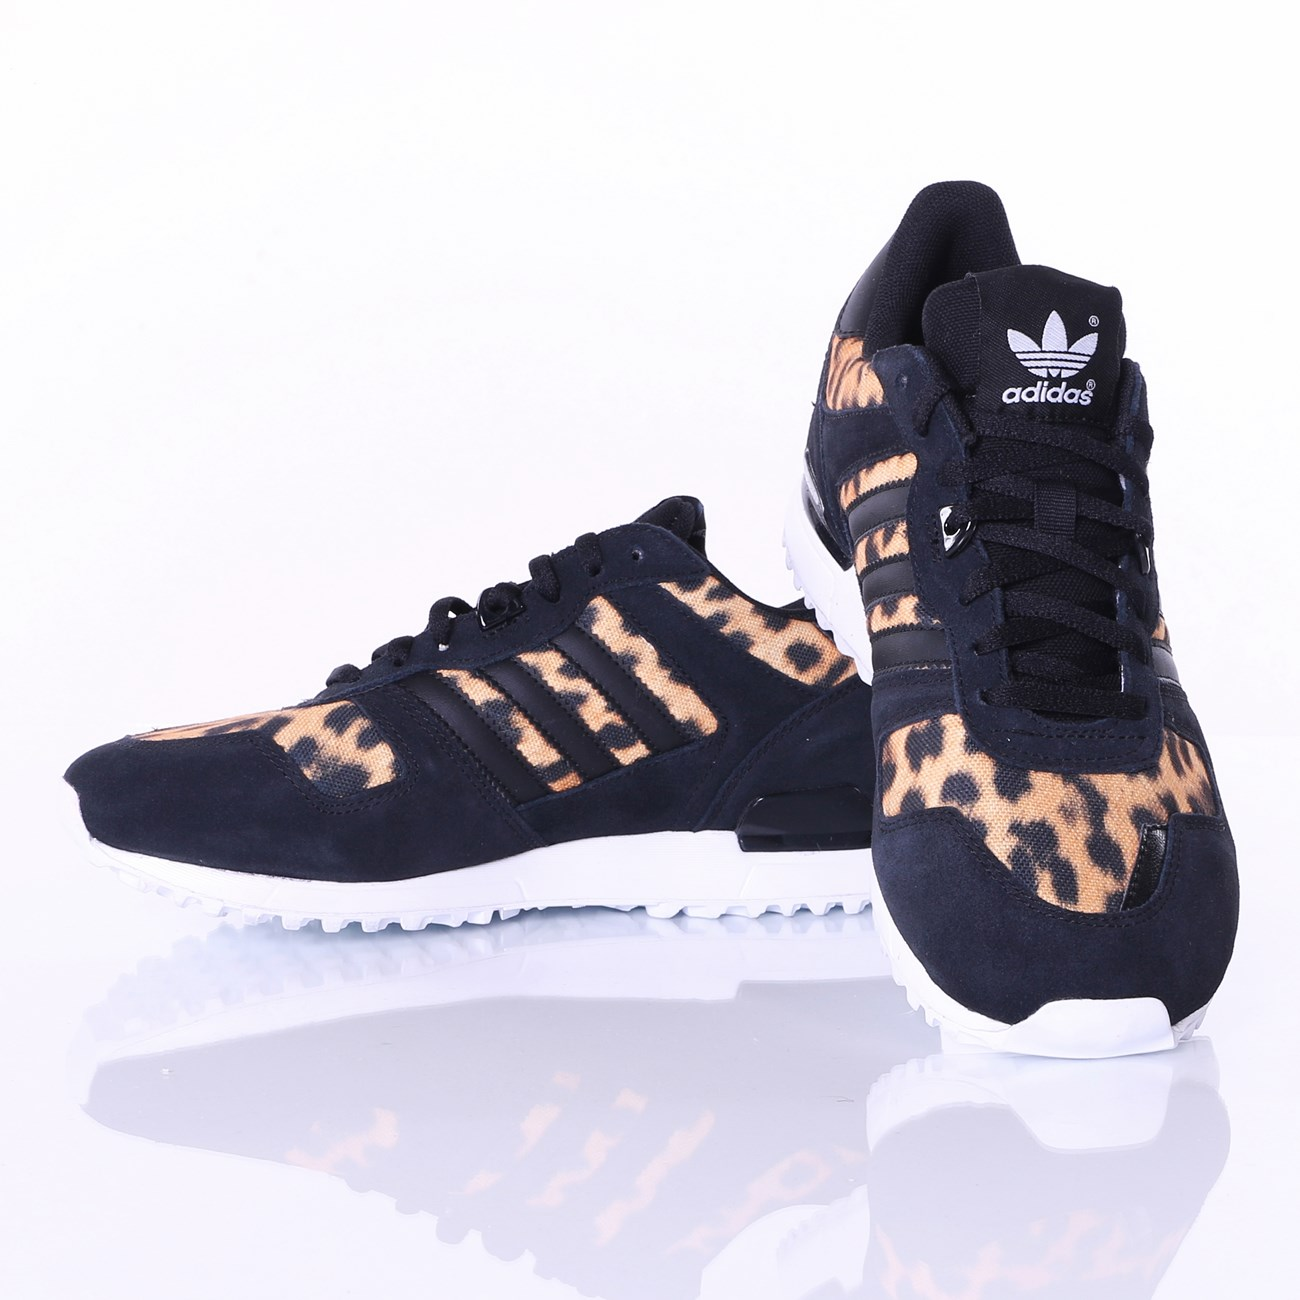 Adidas ZX 700 Zebra Leopard Et nyt dyr? Cool Sneakers